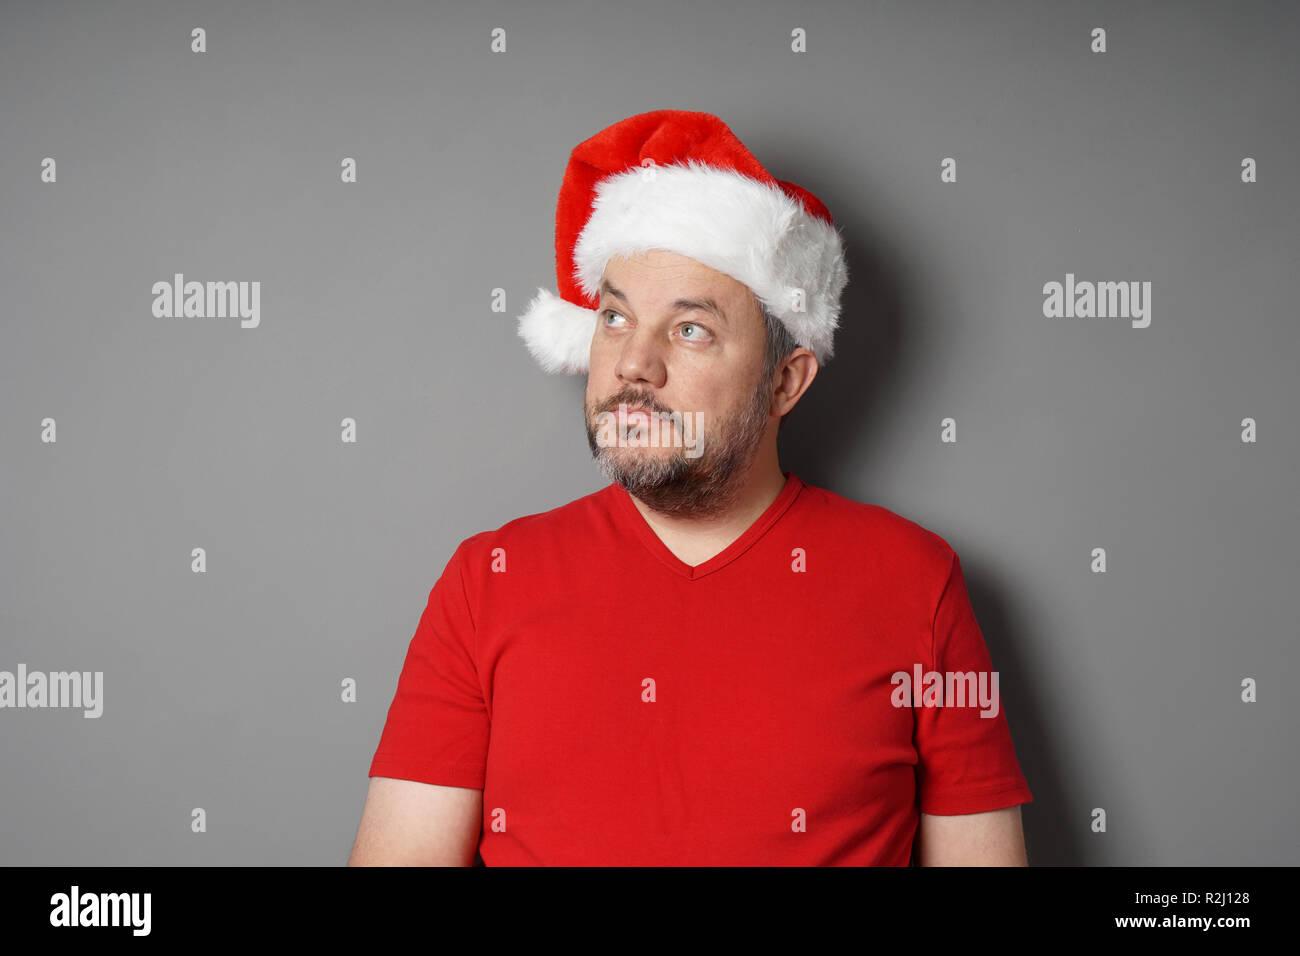 Red T Shirt Stockfotos & Red T Shirt Bilder - Seite 2 - Alamy